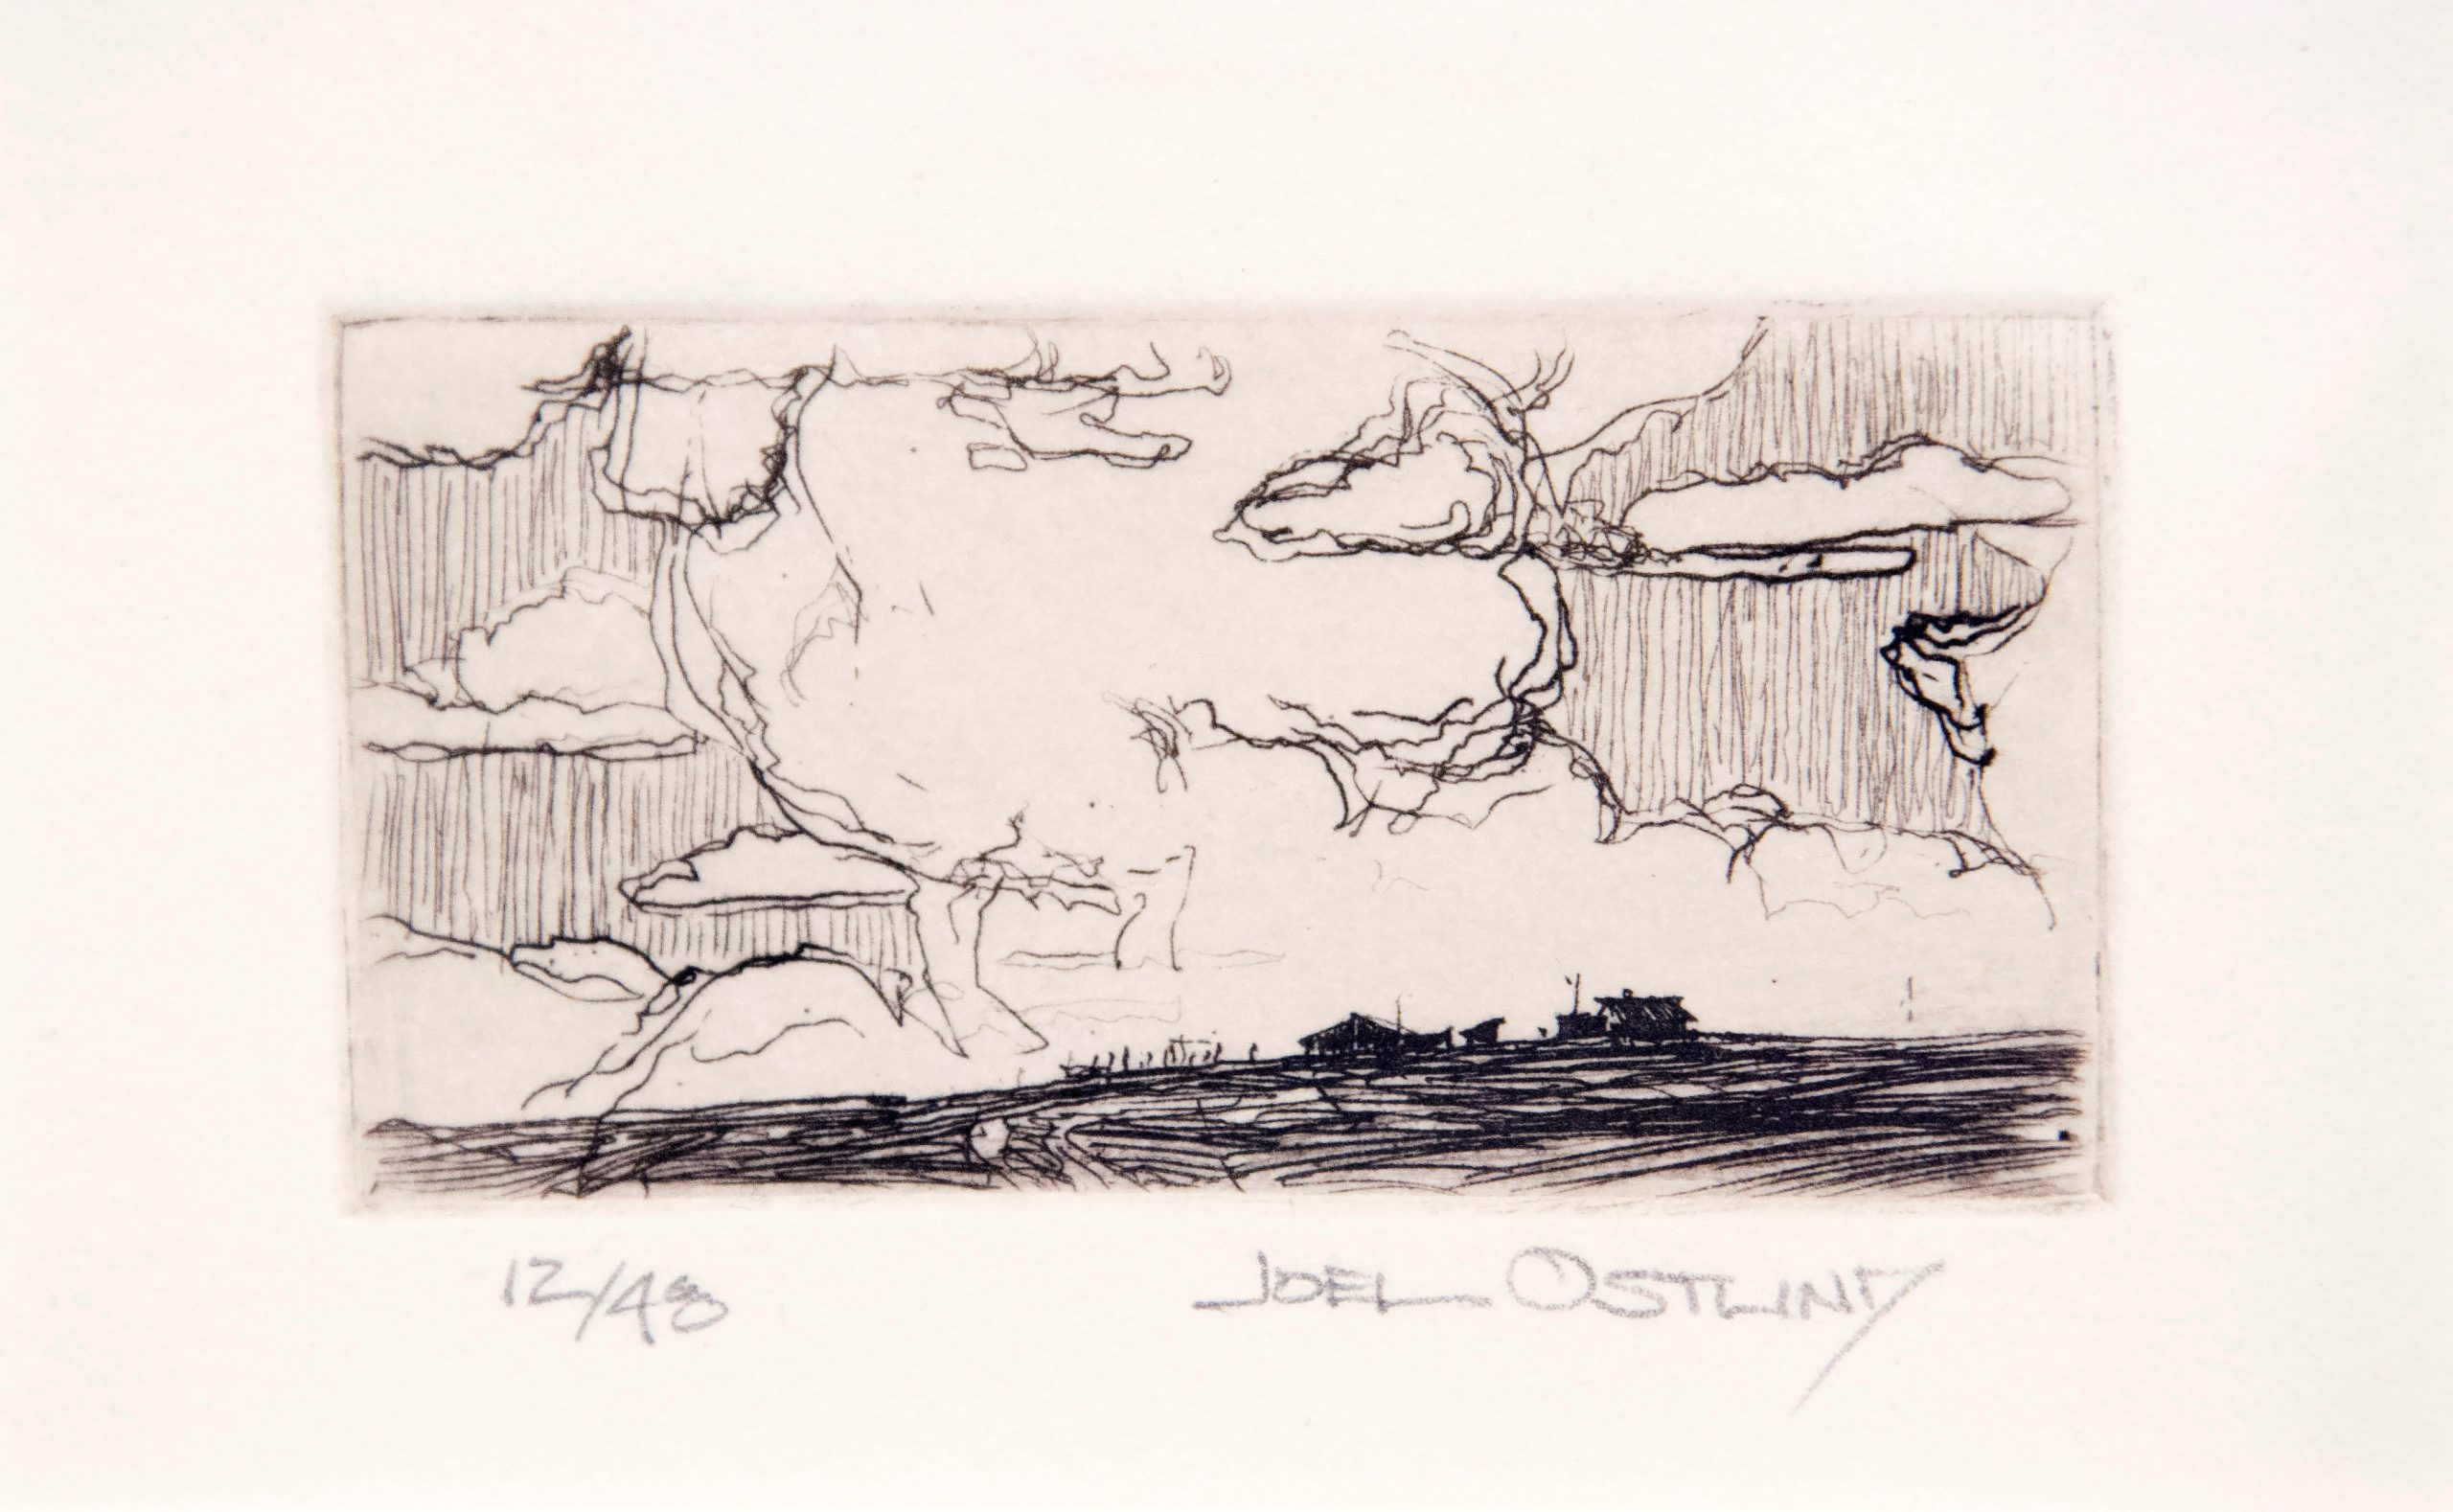 Joel  Ostlind  - World Wide and Sky High, 12/48